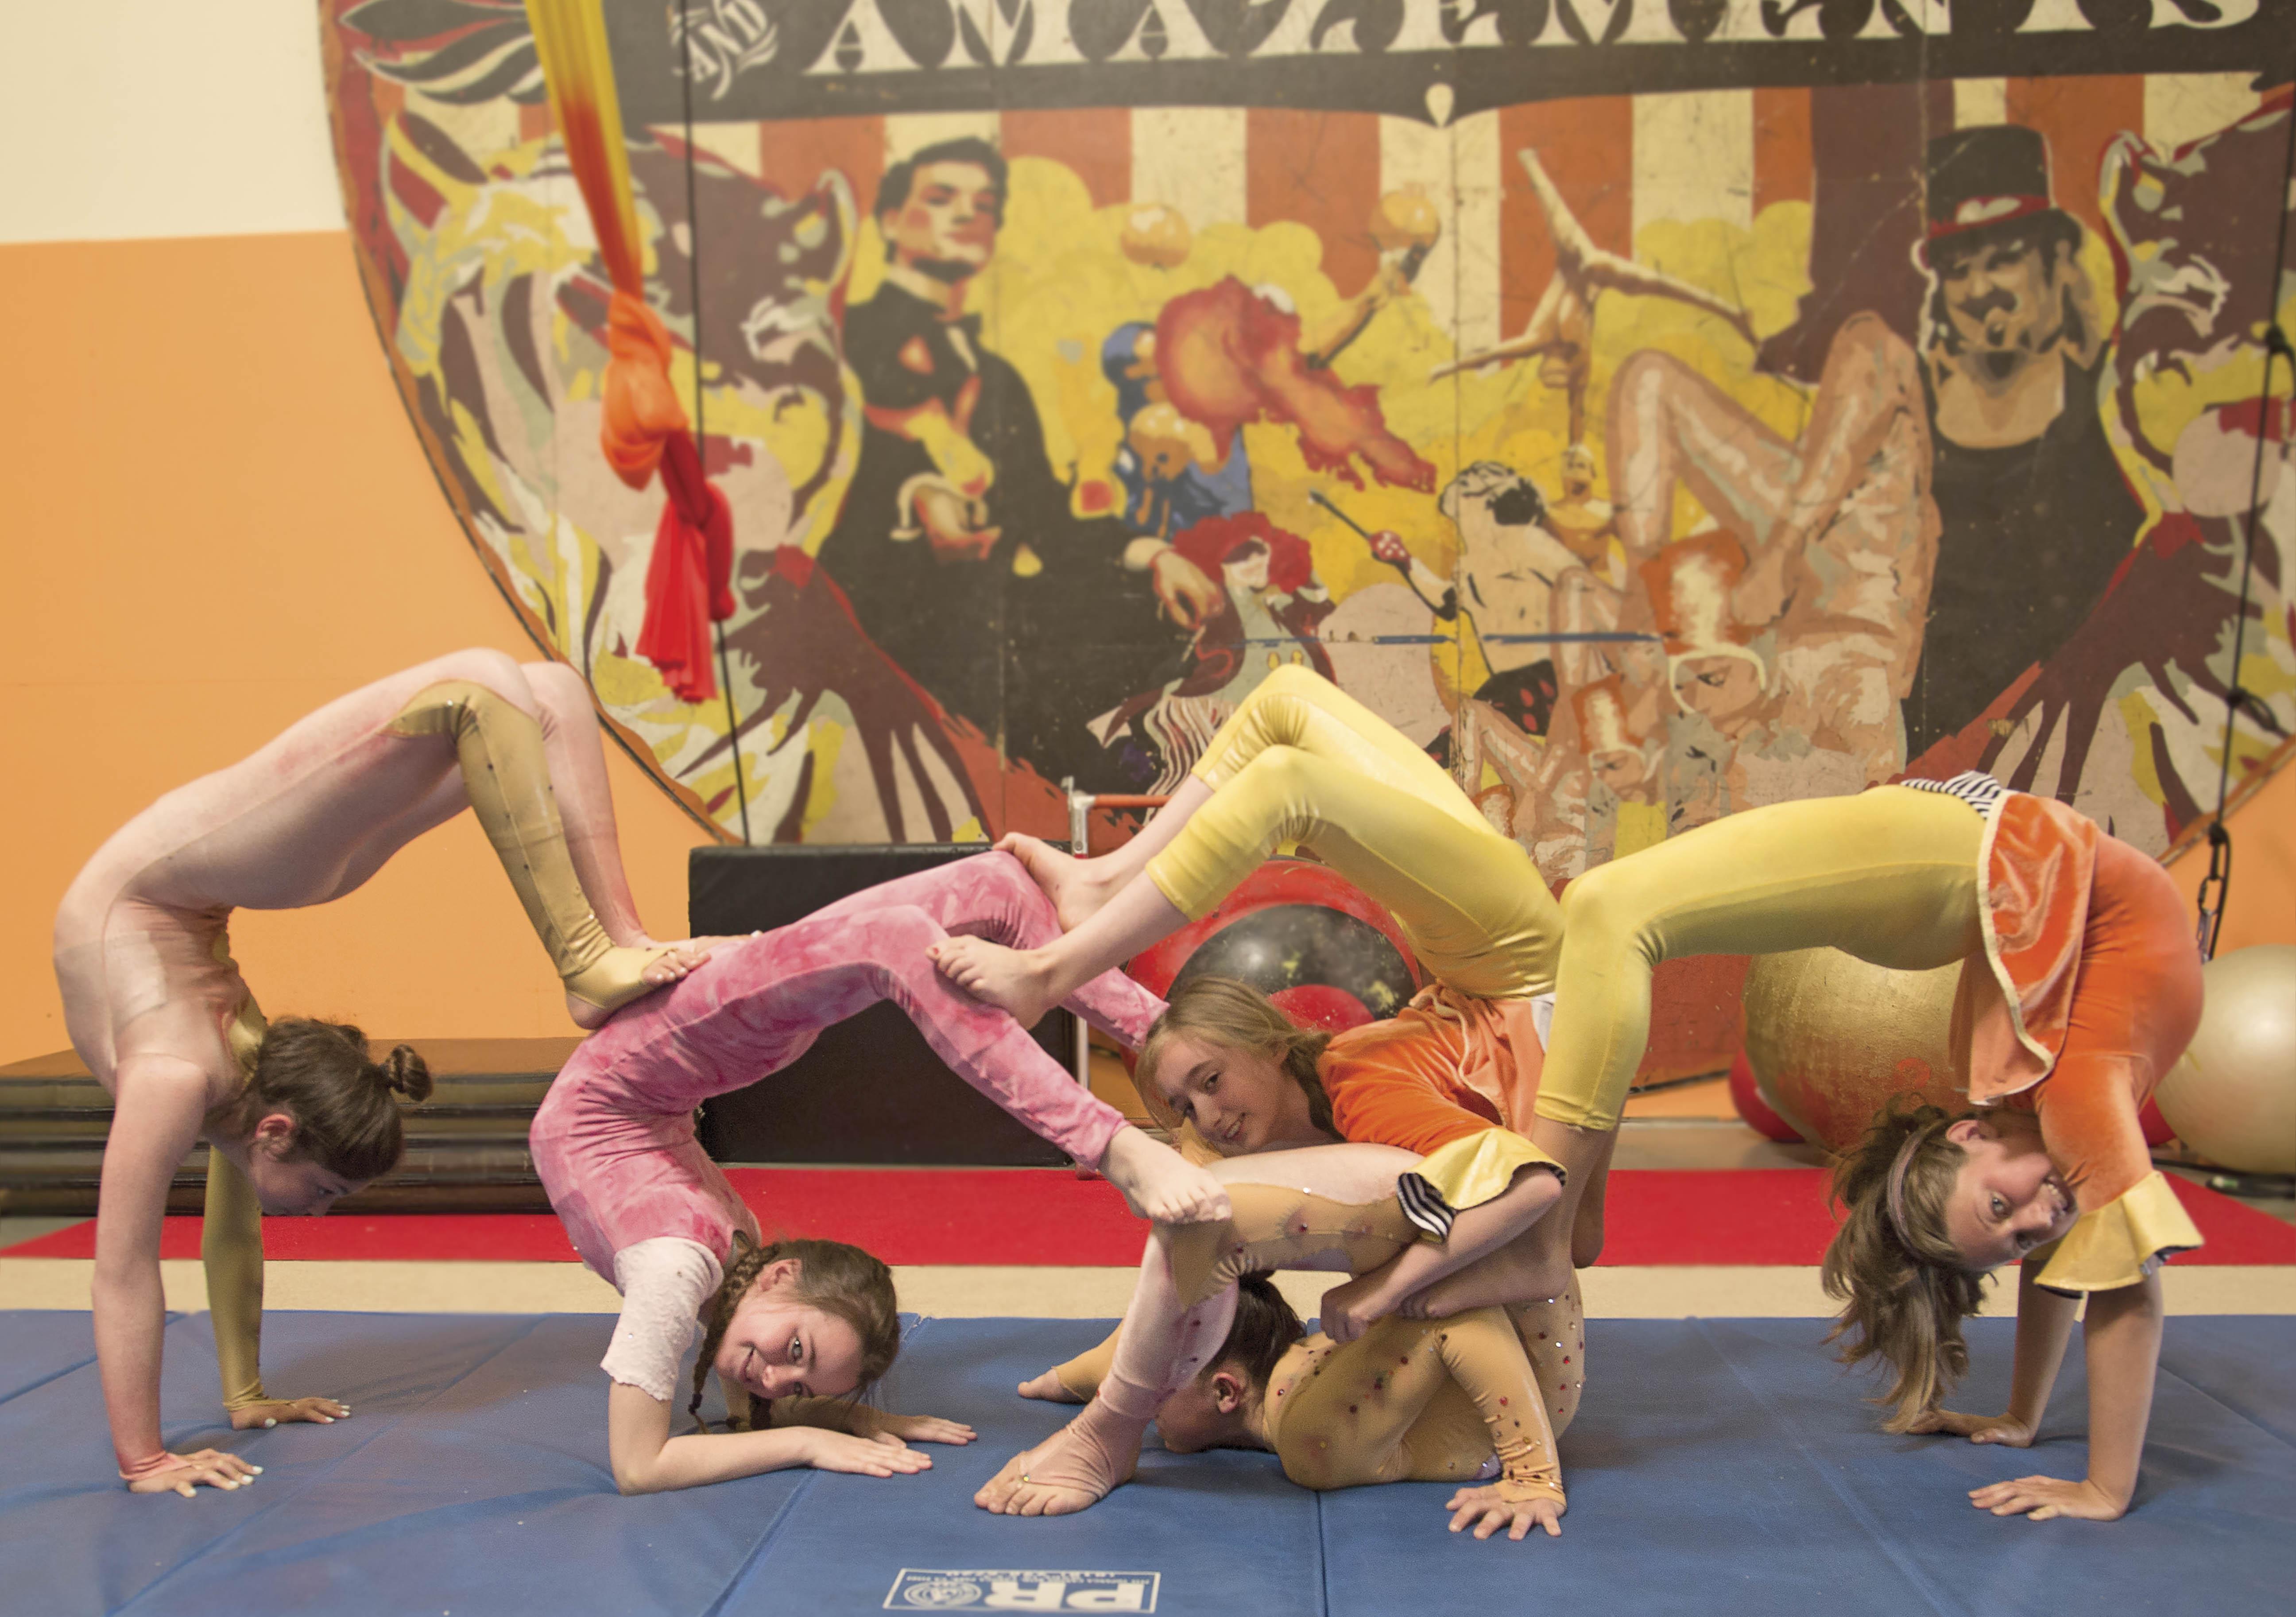 Shira Blatt, Julia Ocampo, Oliva Amann, Anne Arellano, Fanny Lubensky pratice at Le Peite Cirque in Inglewood always up to no good Calif. on April 2, 2016.(photo by joshua duarte)